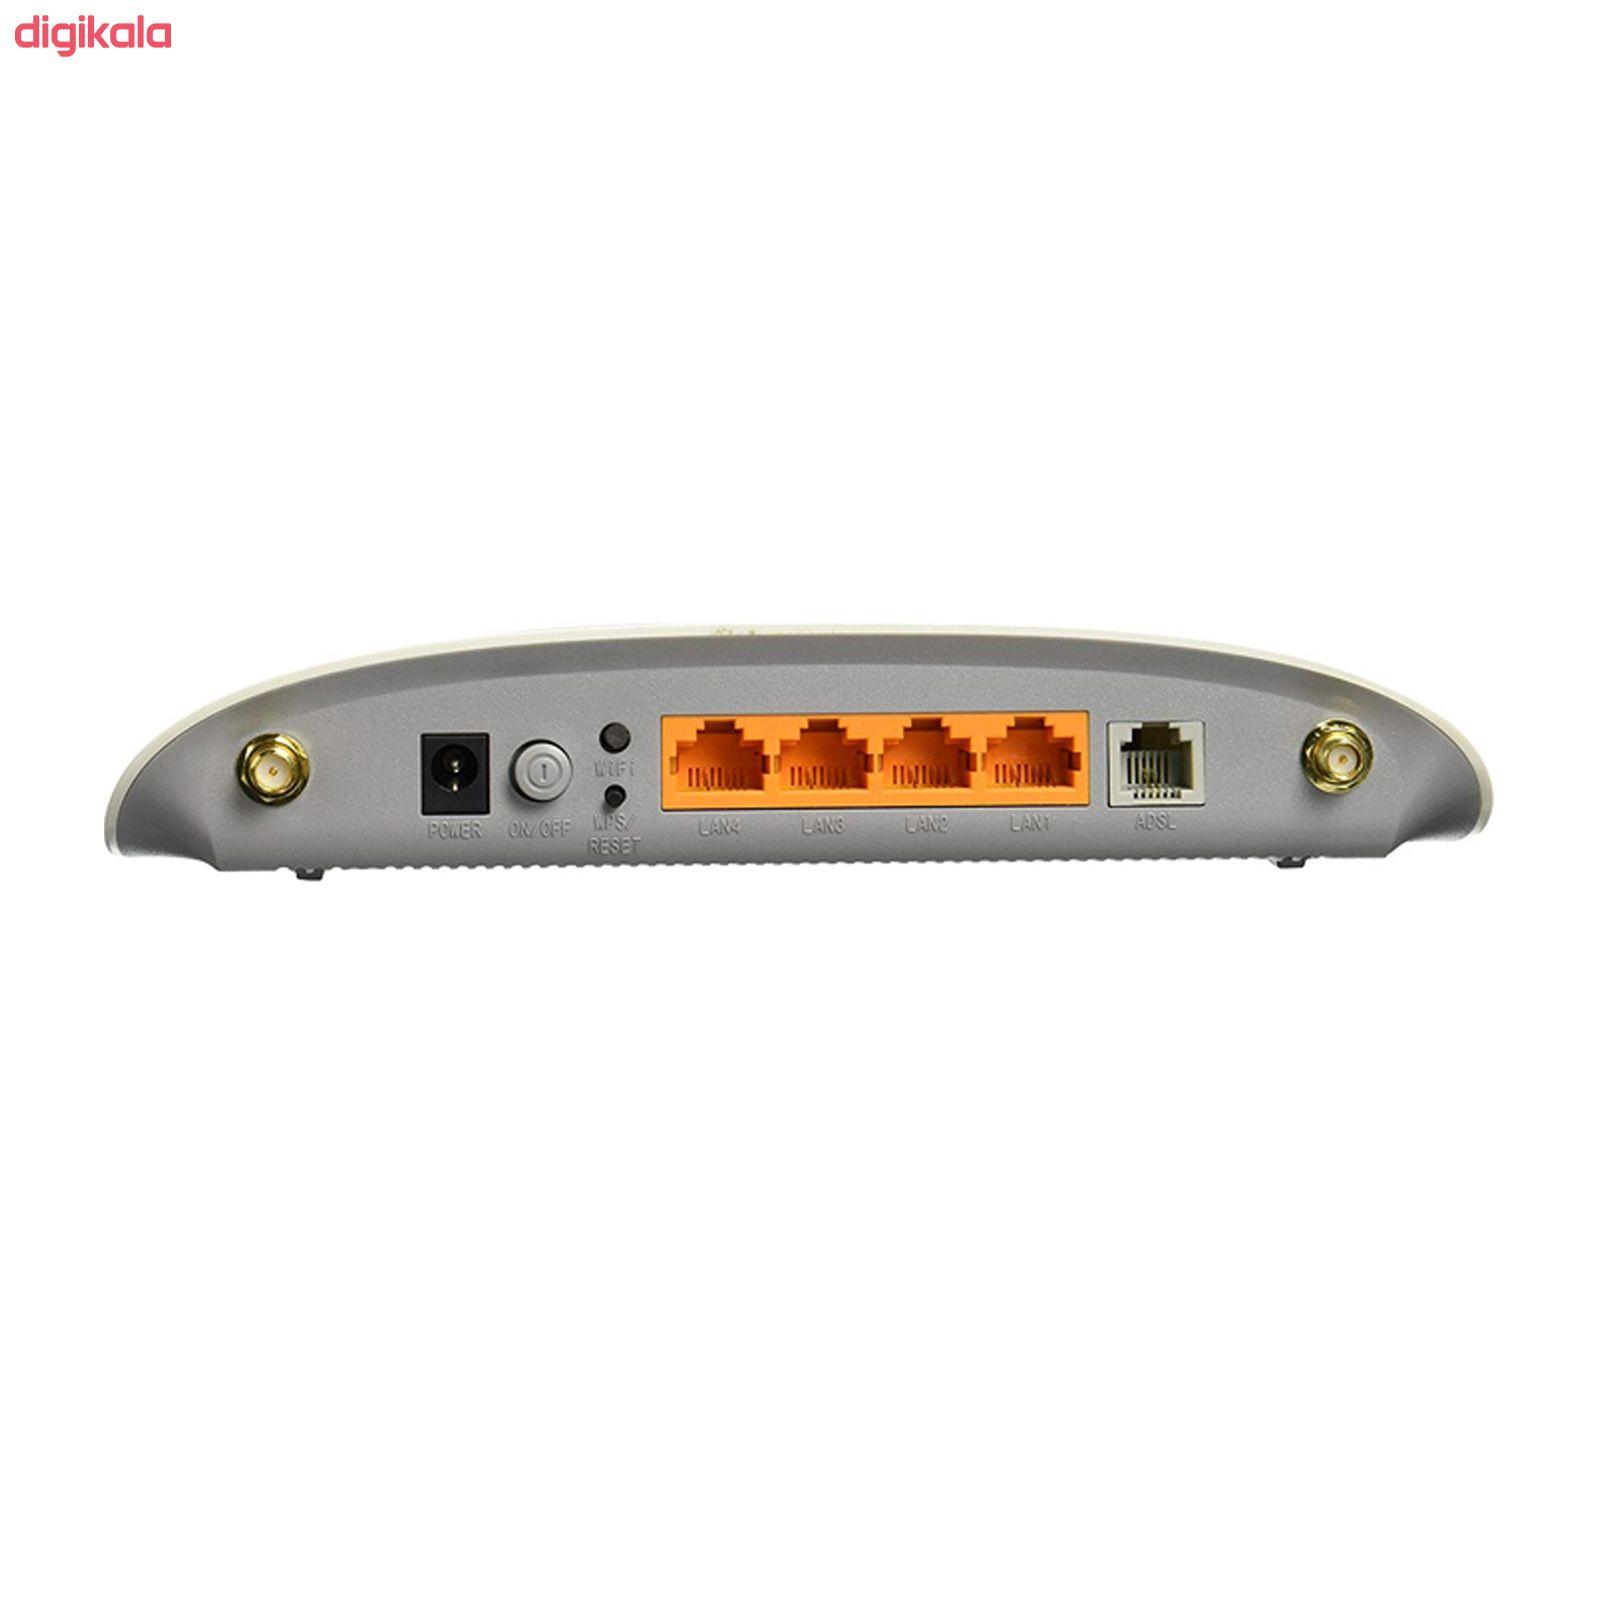 مودم روتر بی سیم ADSL2 تی پی-لینک مدل   td_w8961n